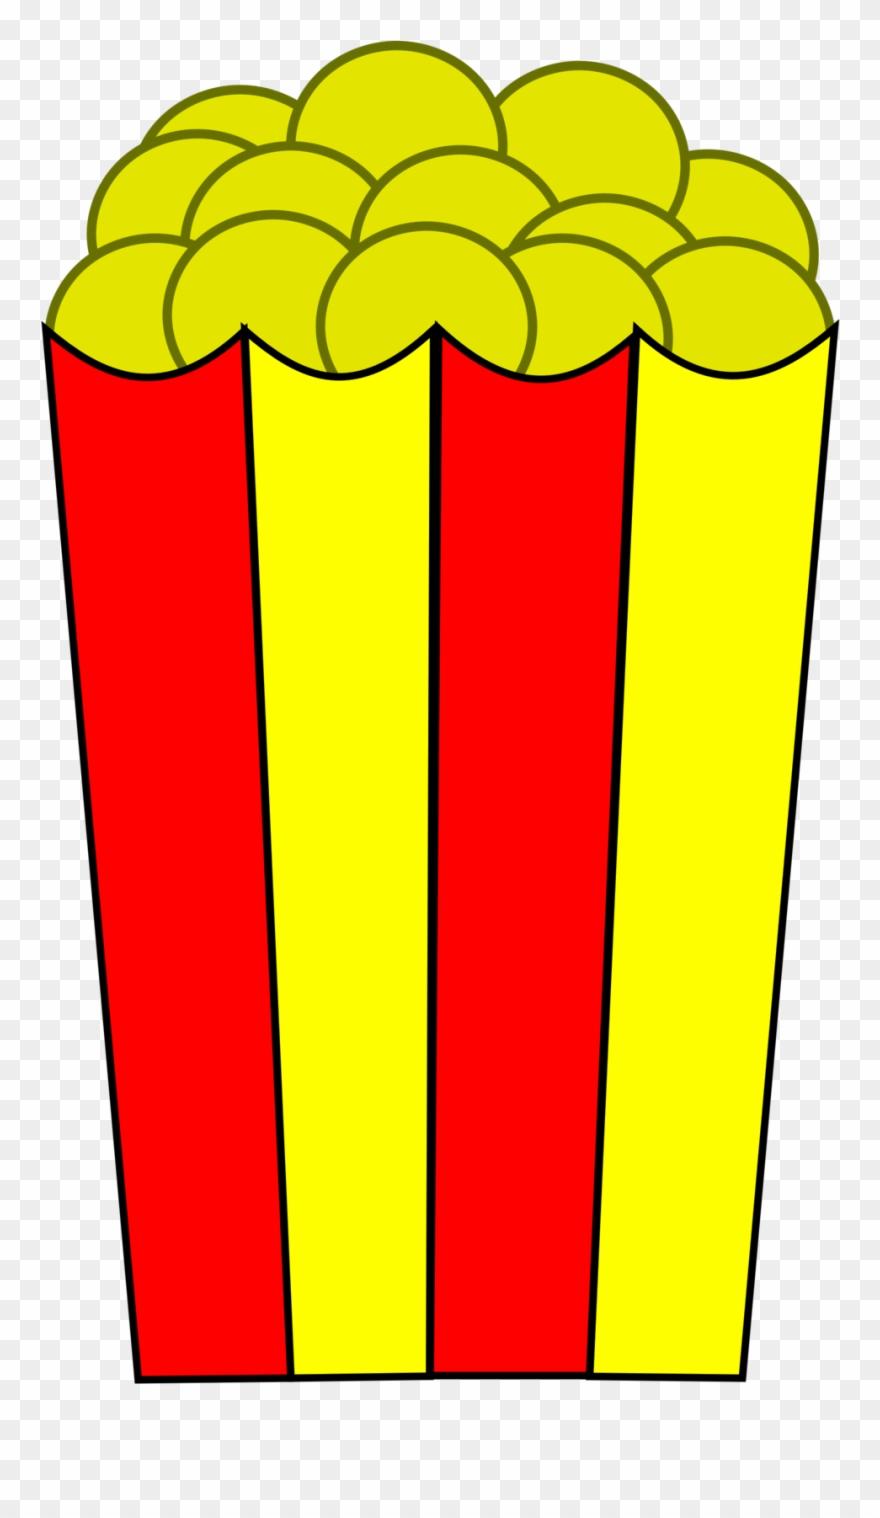 popcorn # 4889747